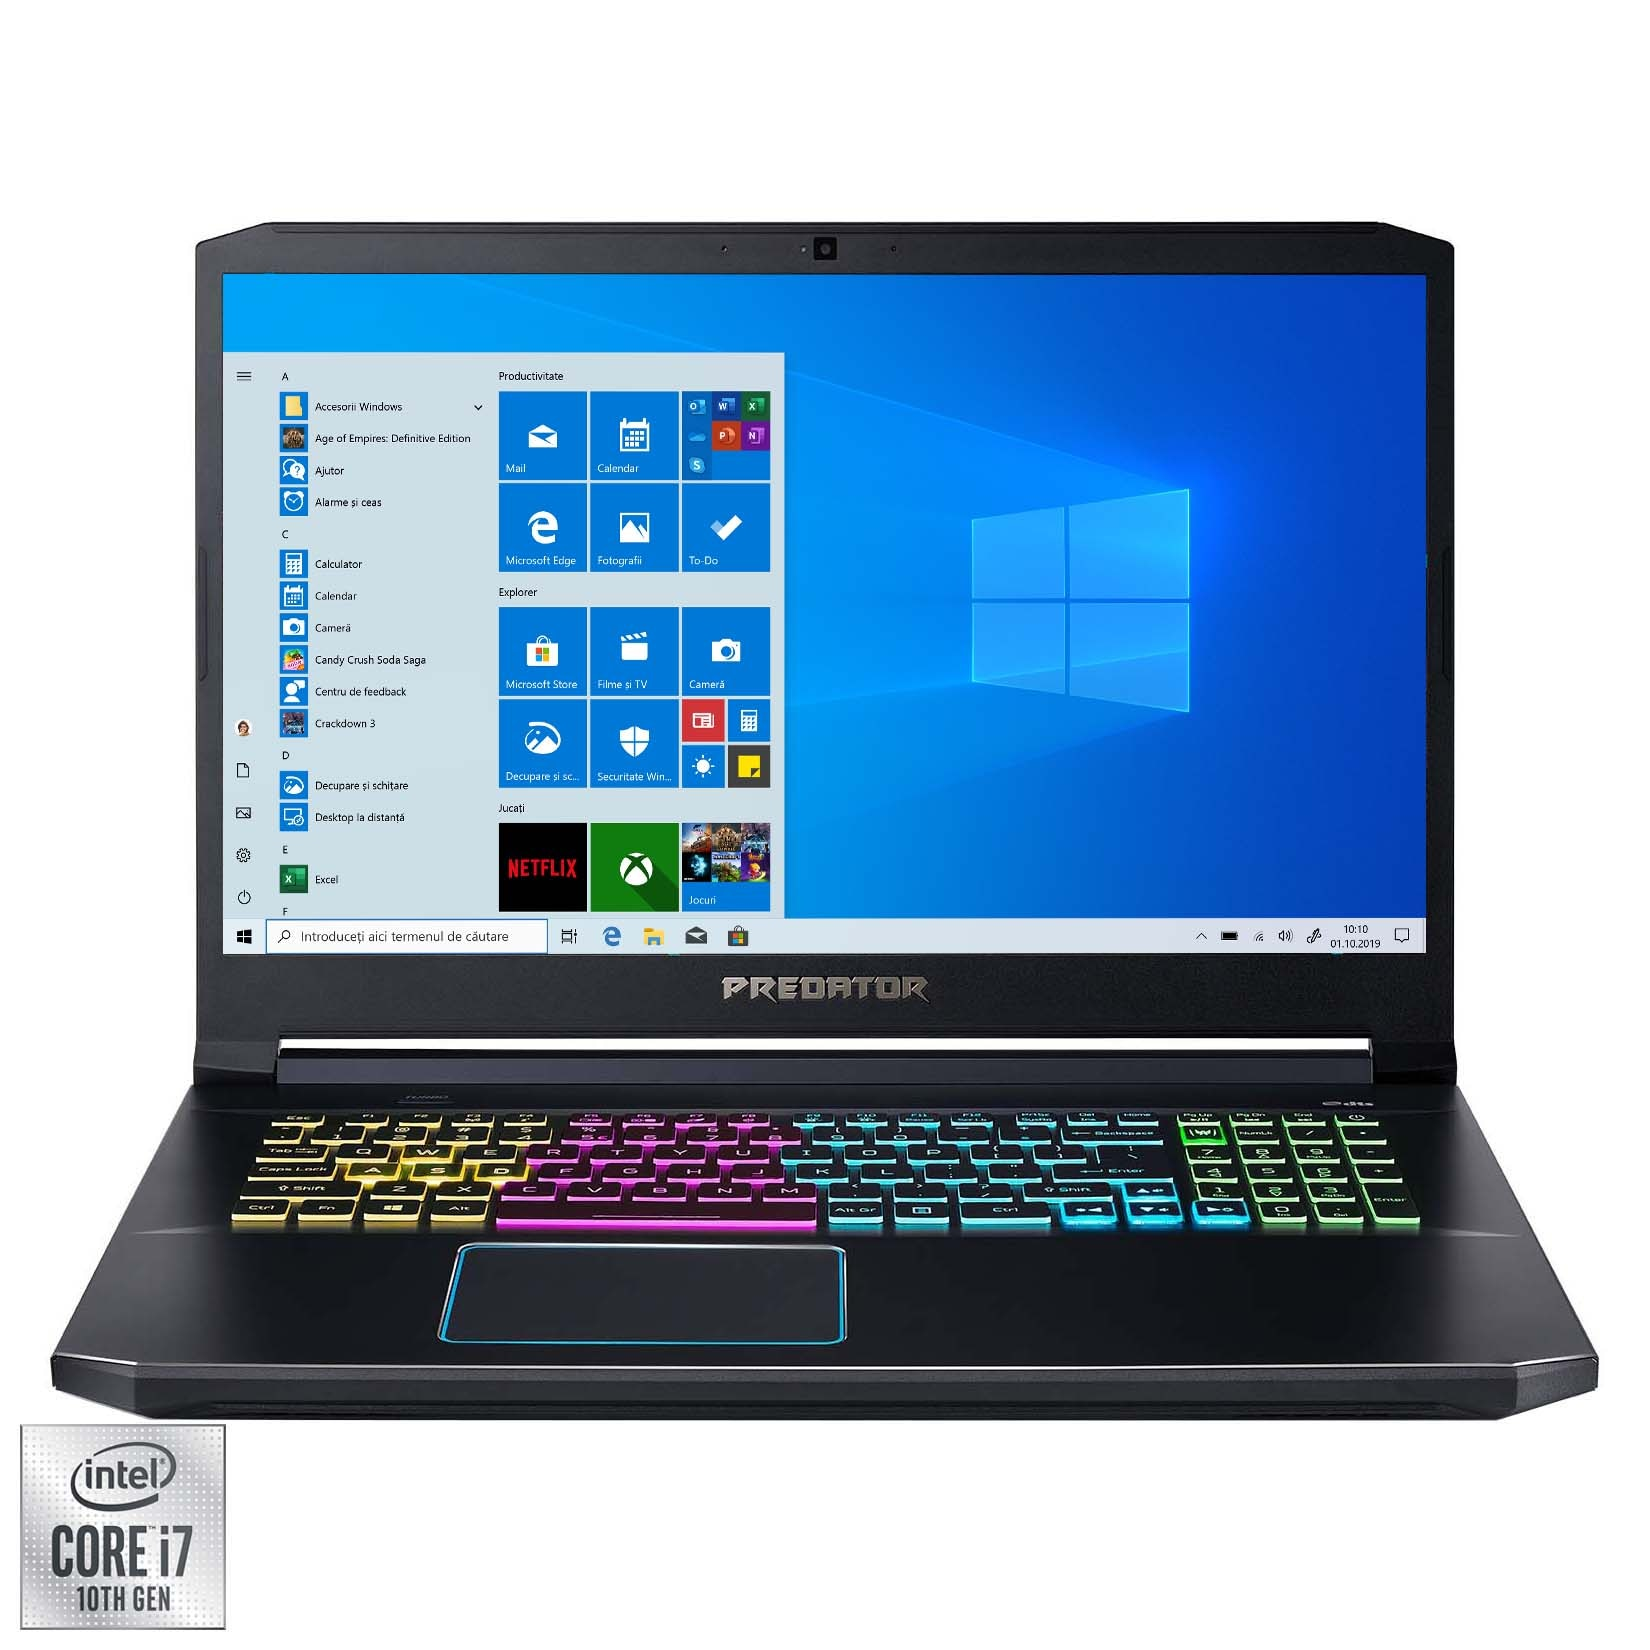 "Fotografie Laptop Gaming Acer Predator Helios 300 PH317-54 cu procesor Intel® Core™ i7-10750H pana la 5.00 GHz, 17.3"", Full HD, 120Hz, 8GB, 512GB SSD, NVIDIA® GeForce RTX™ 2060 6GB, Windows 10 Home, Black"